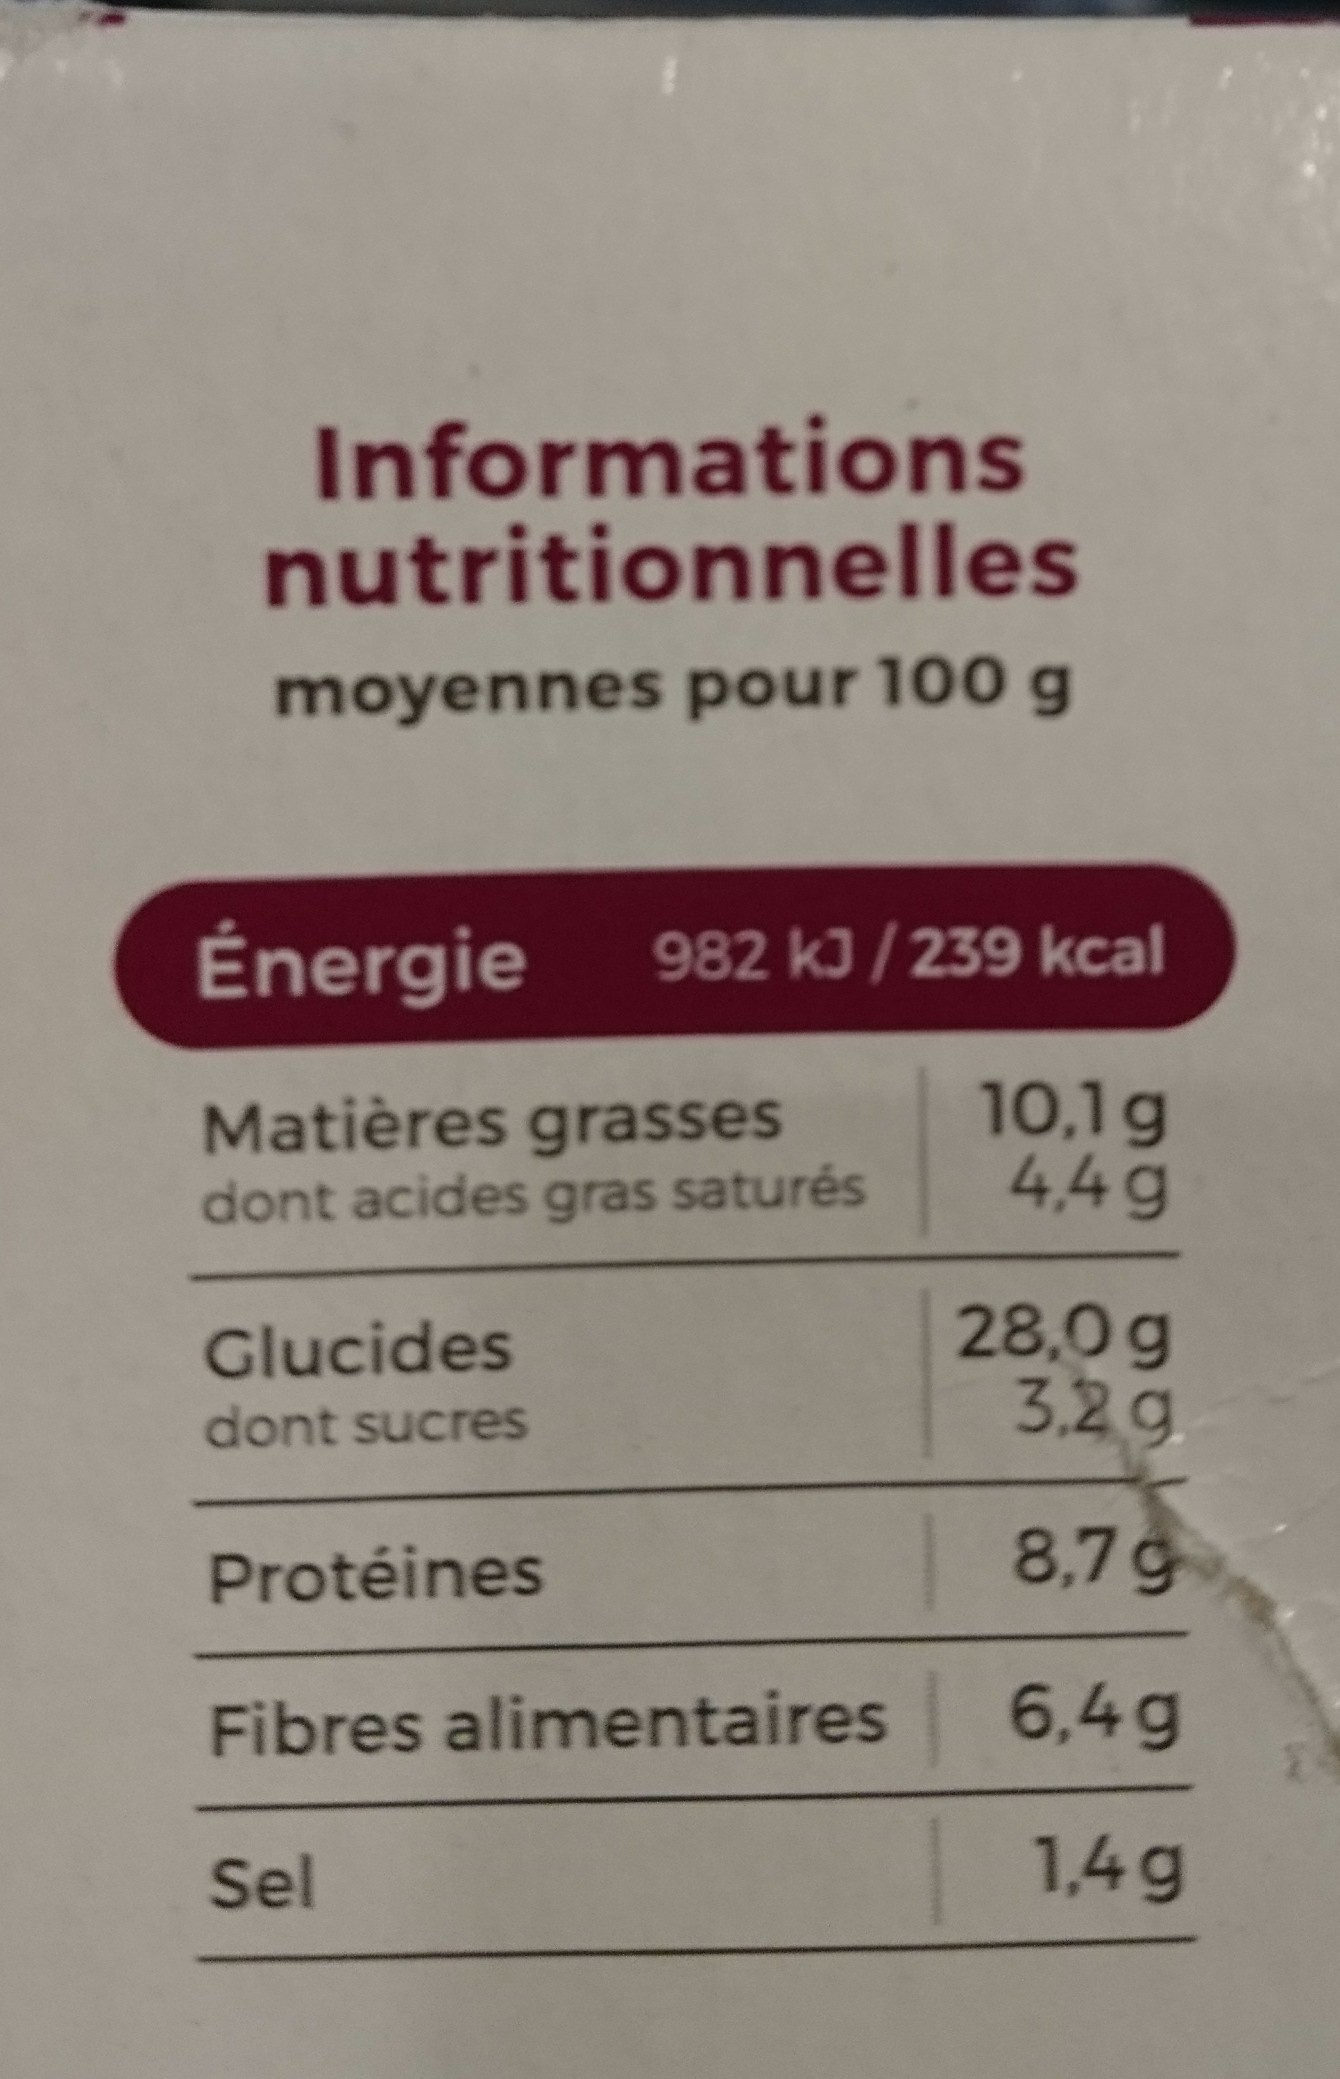 Blé fumé comme un risotto, piperade basque - Nutrition facts